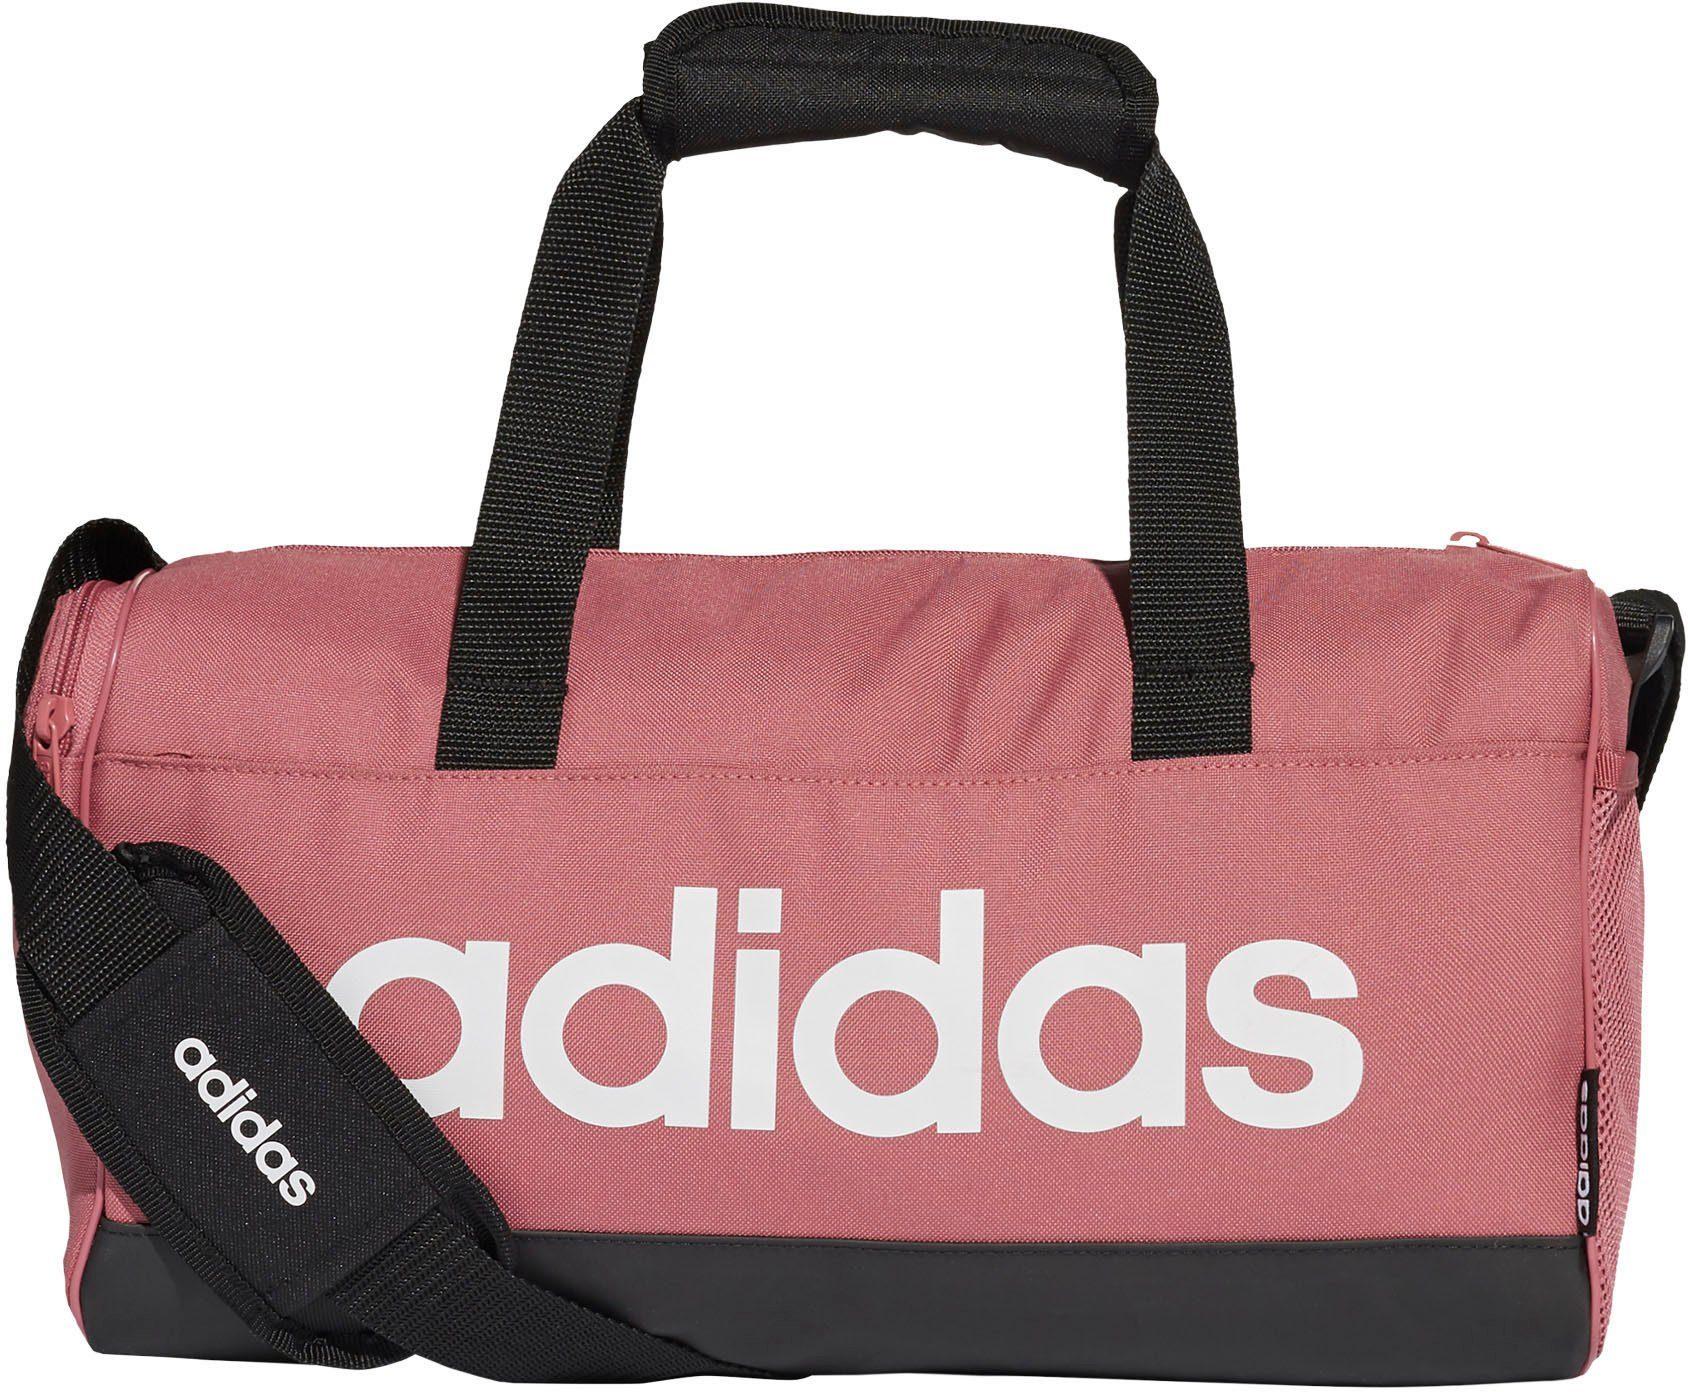 adidas Sporttasche »LINEAR DUFFLE XS«, Logodruck online kaufen   OTTO